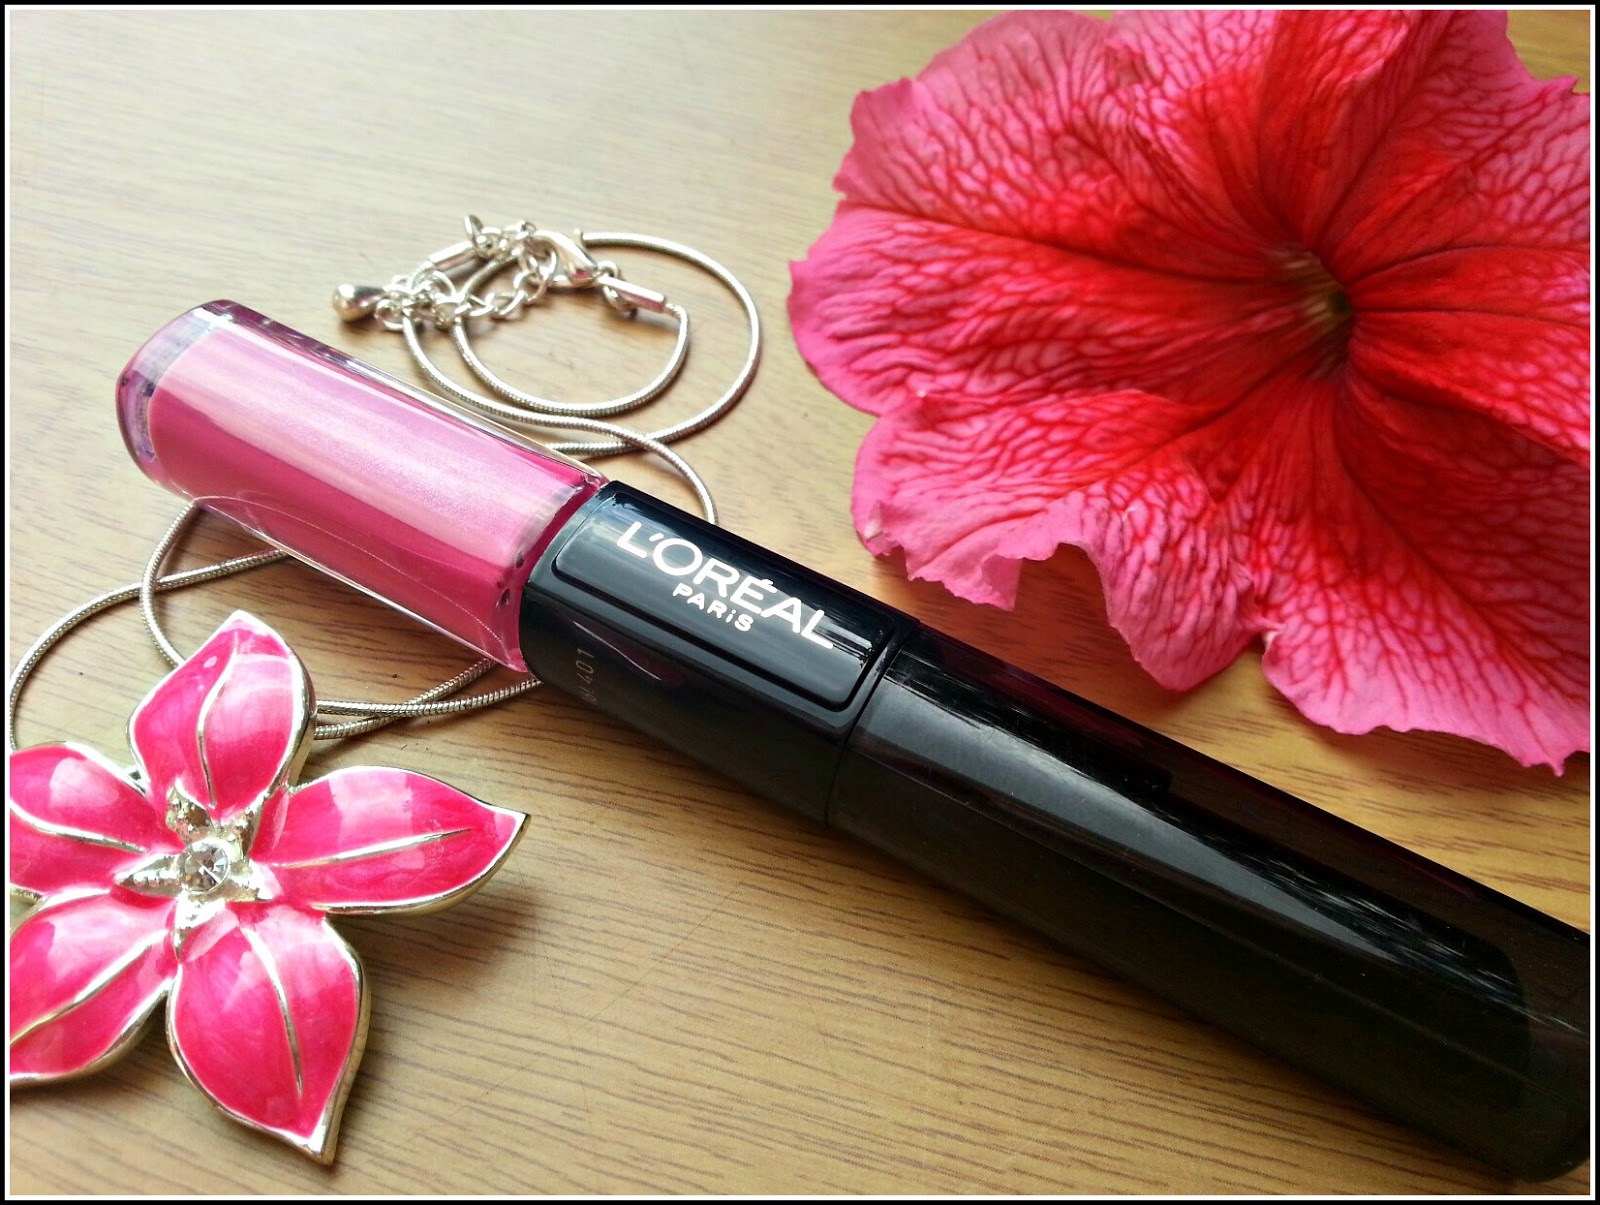 L'Oréal_Paris_Infallible_24H_Lip_Colour_Flawless_Fuchsia